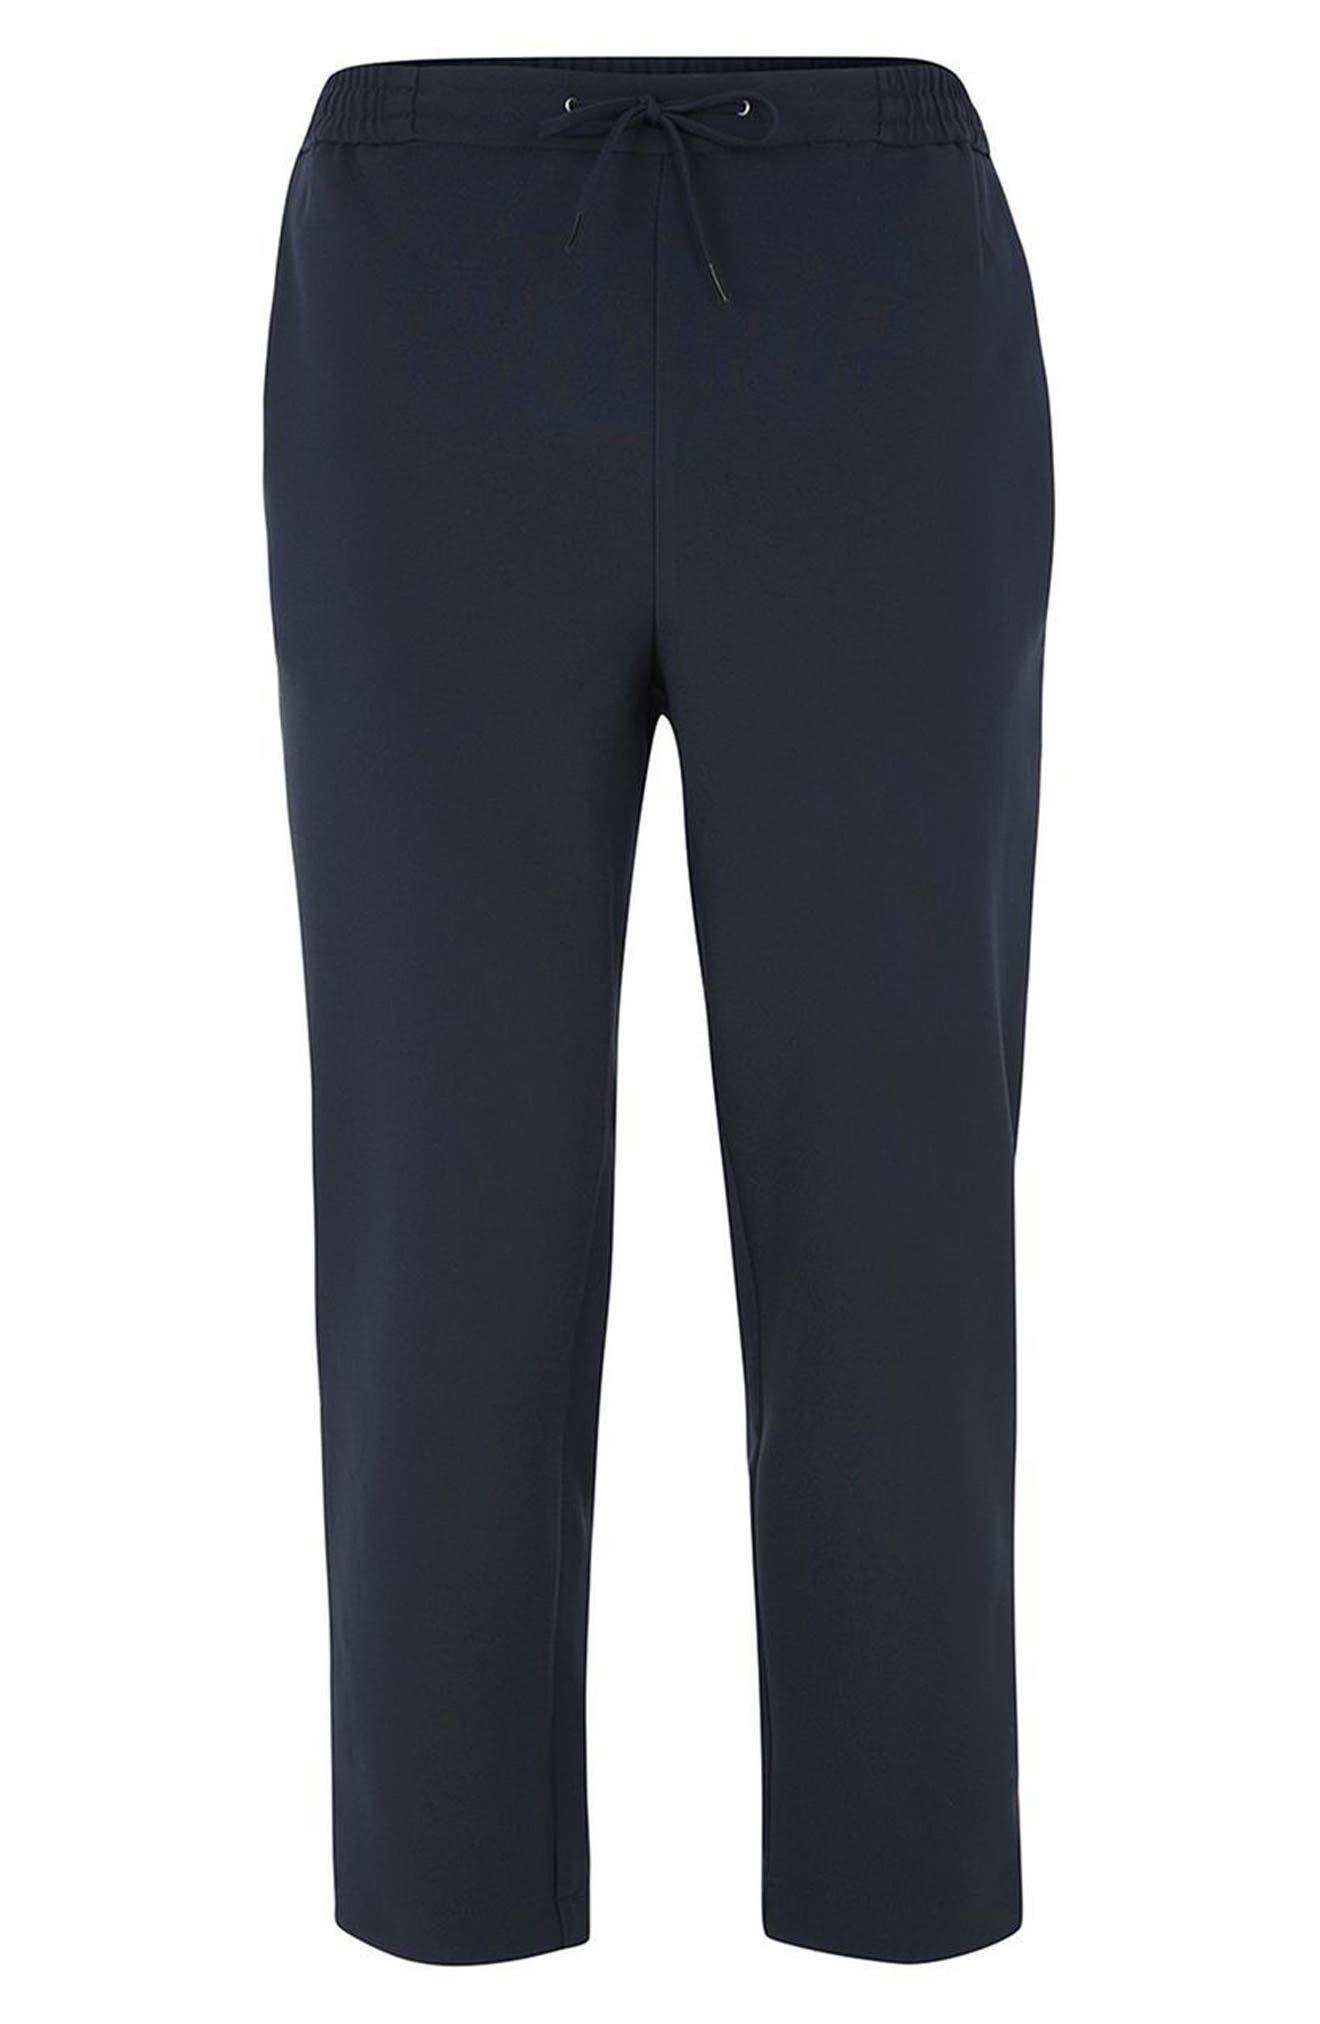 Topman Cropped Slim Fit Jogger Pants